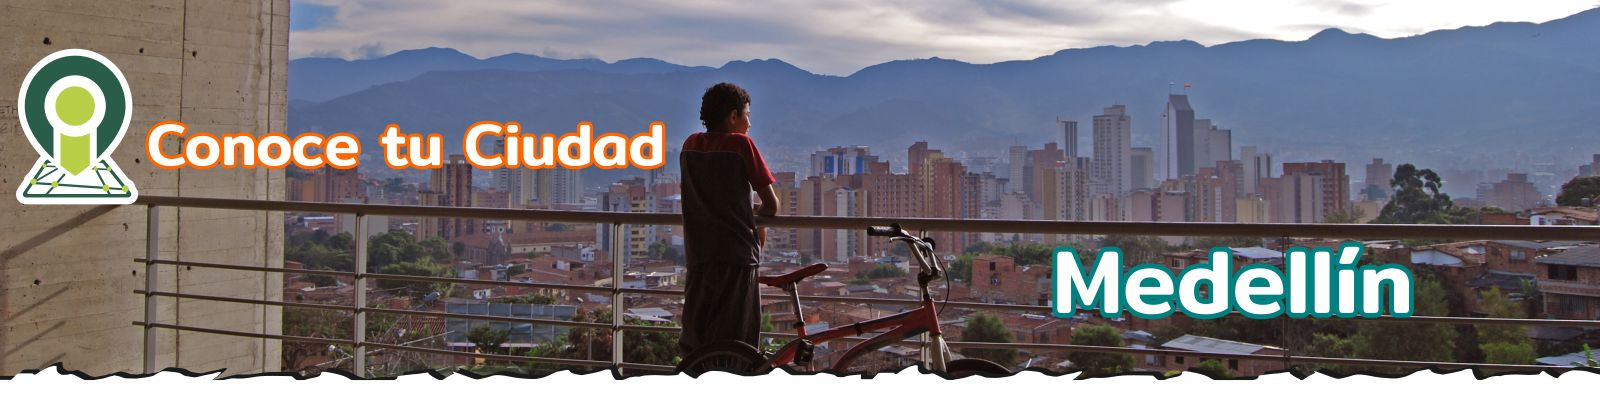 head-turismo2.jpg